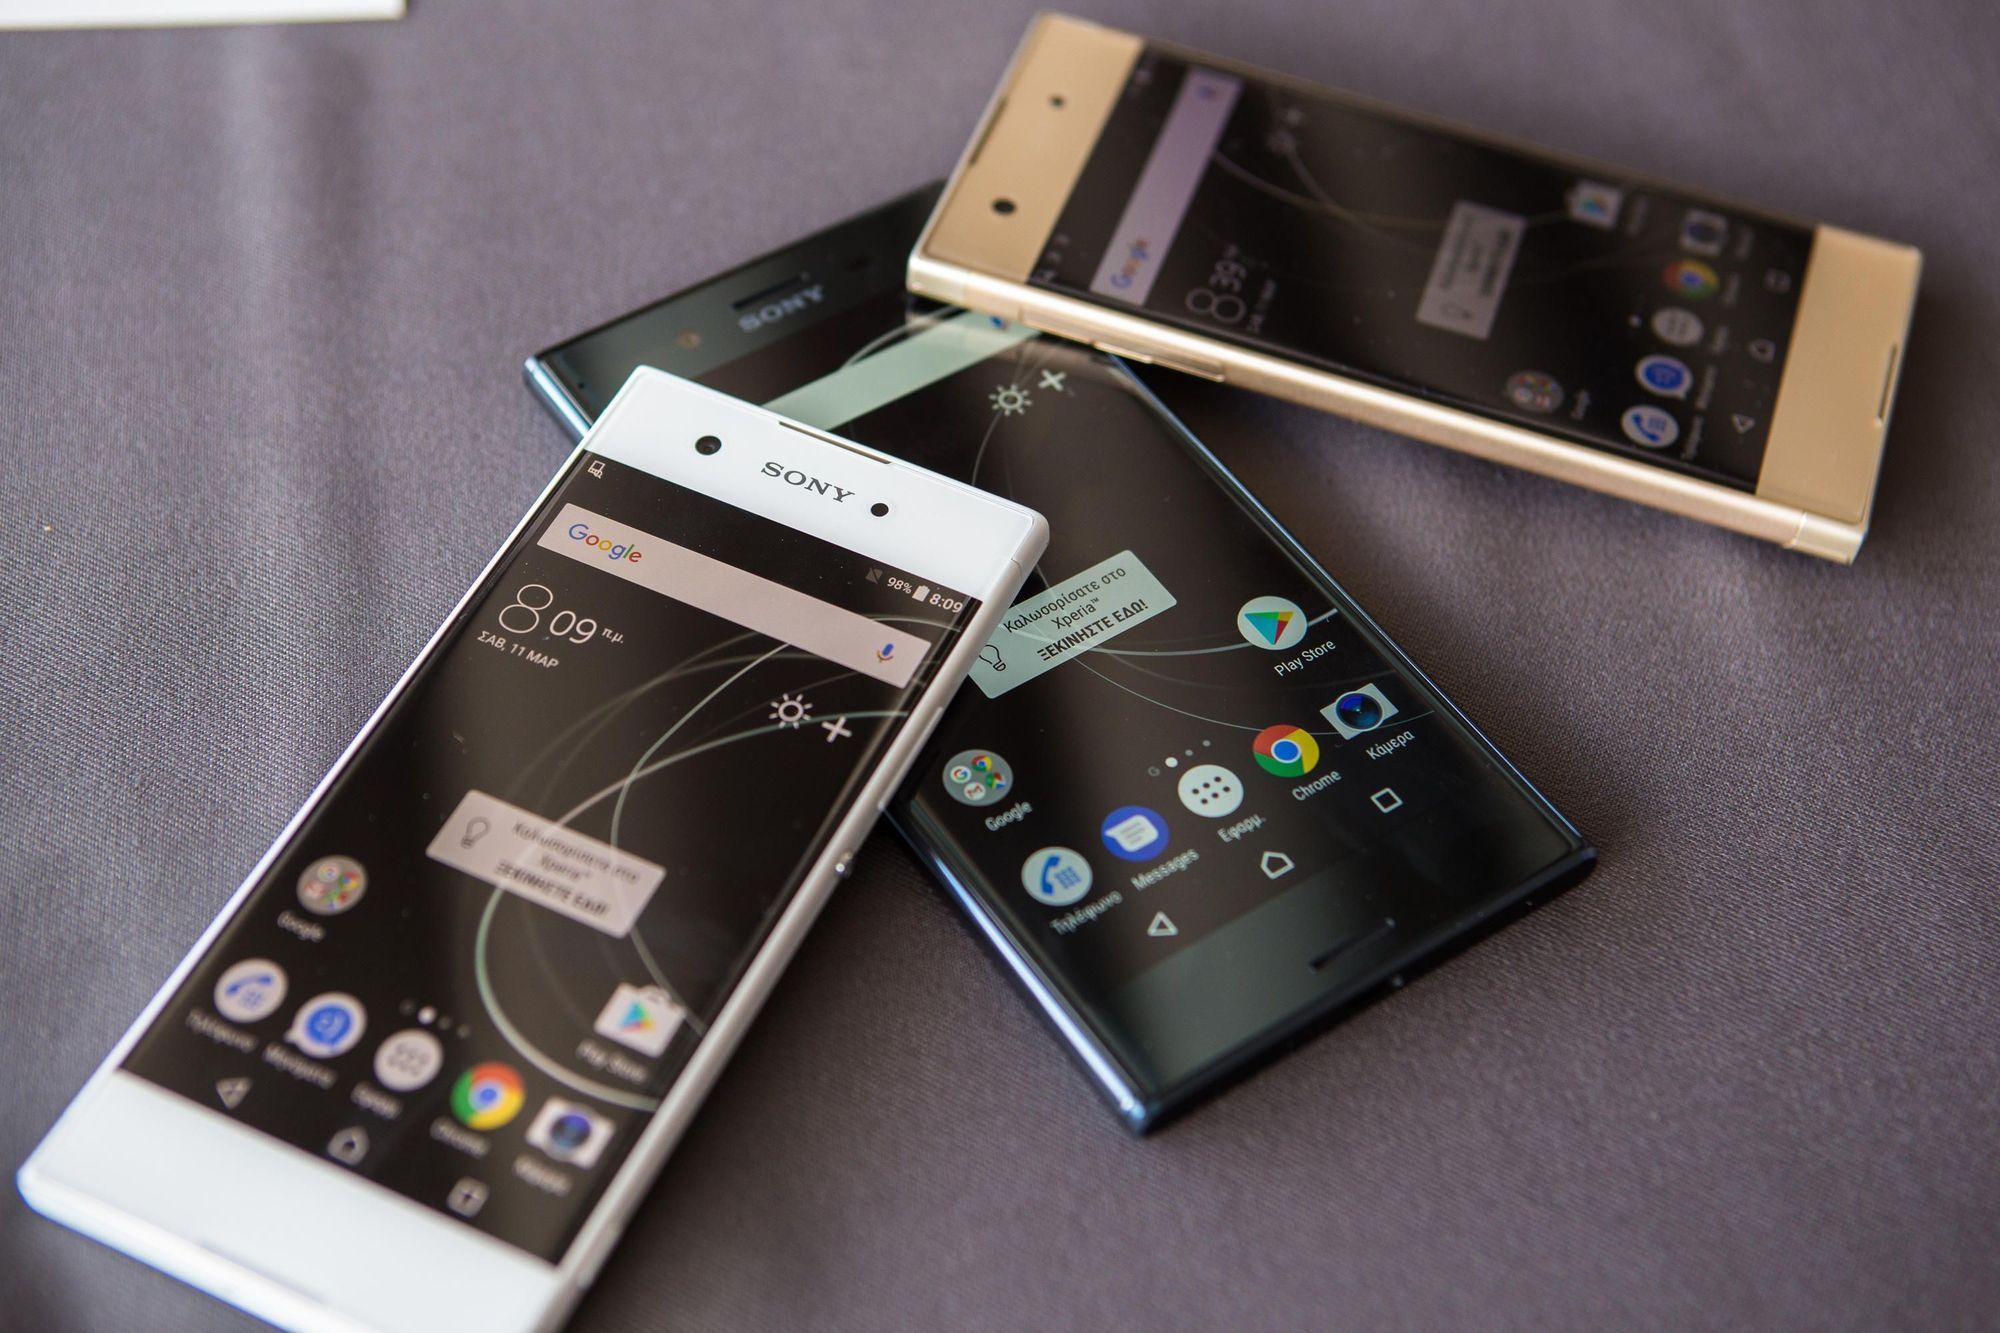 Sony Xperia XZ Premium - Gadgets - αθηνόραμα digital